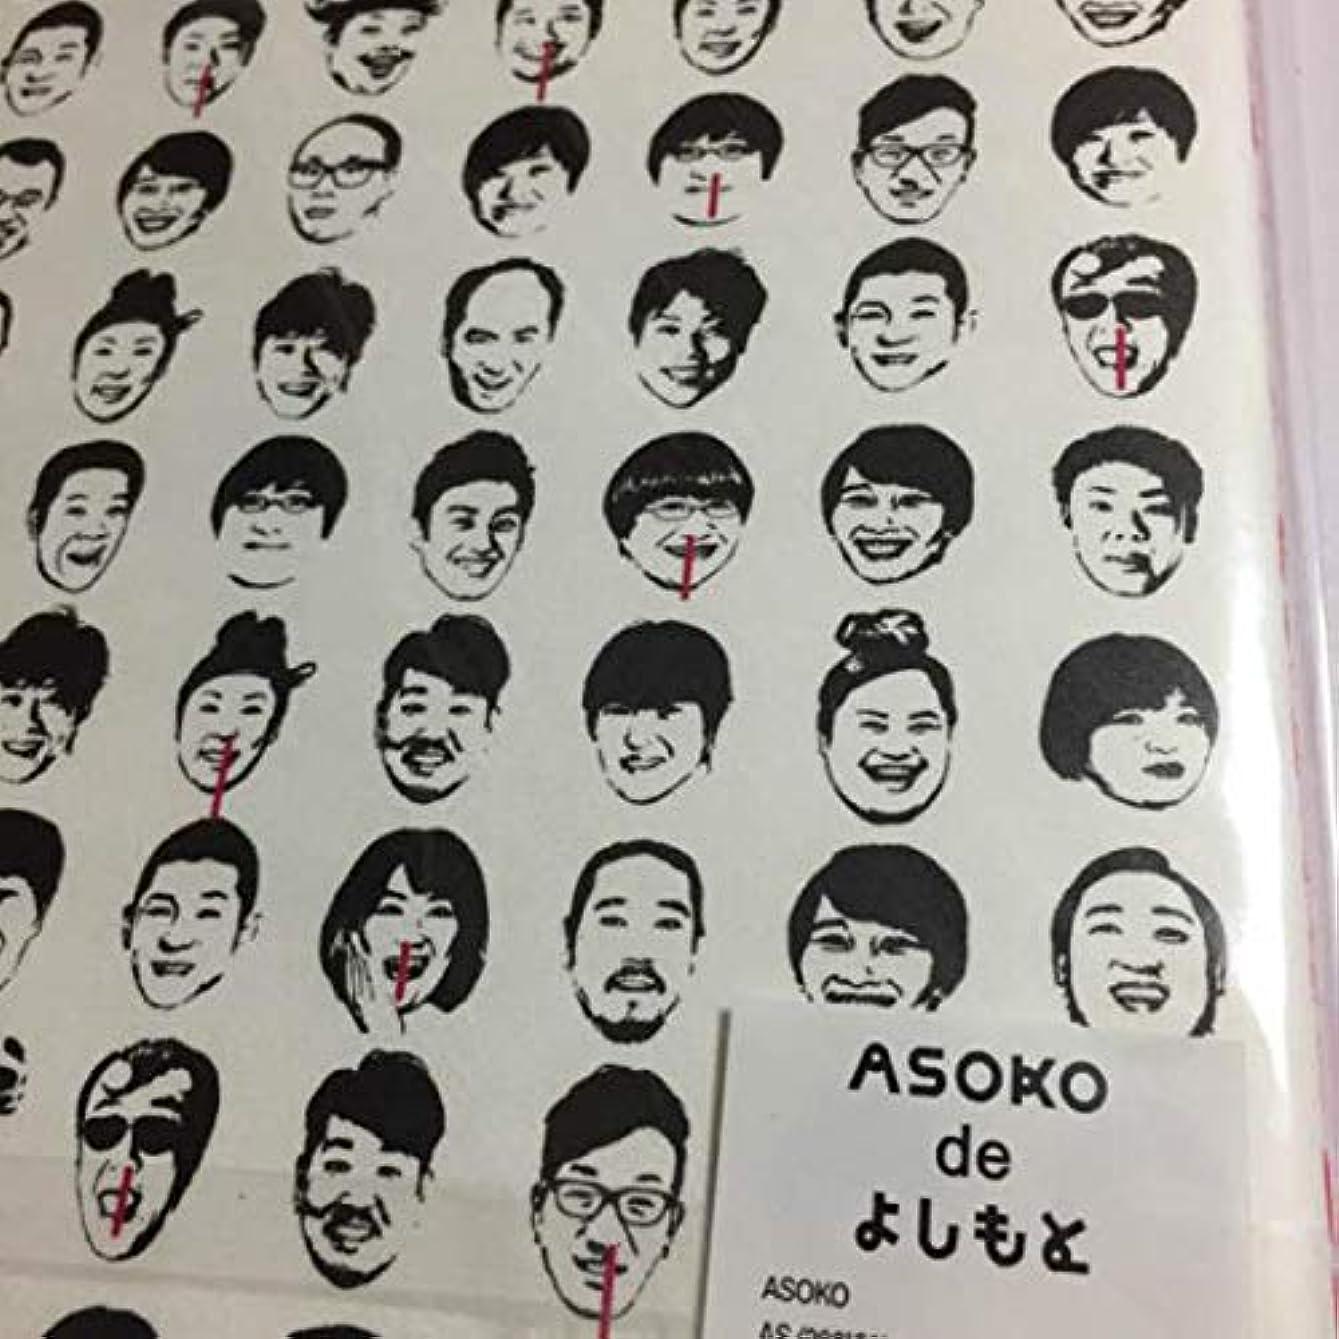 ASOKO de よしもと ノート サイズ 約21×15cm B6サイズ